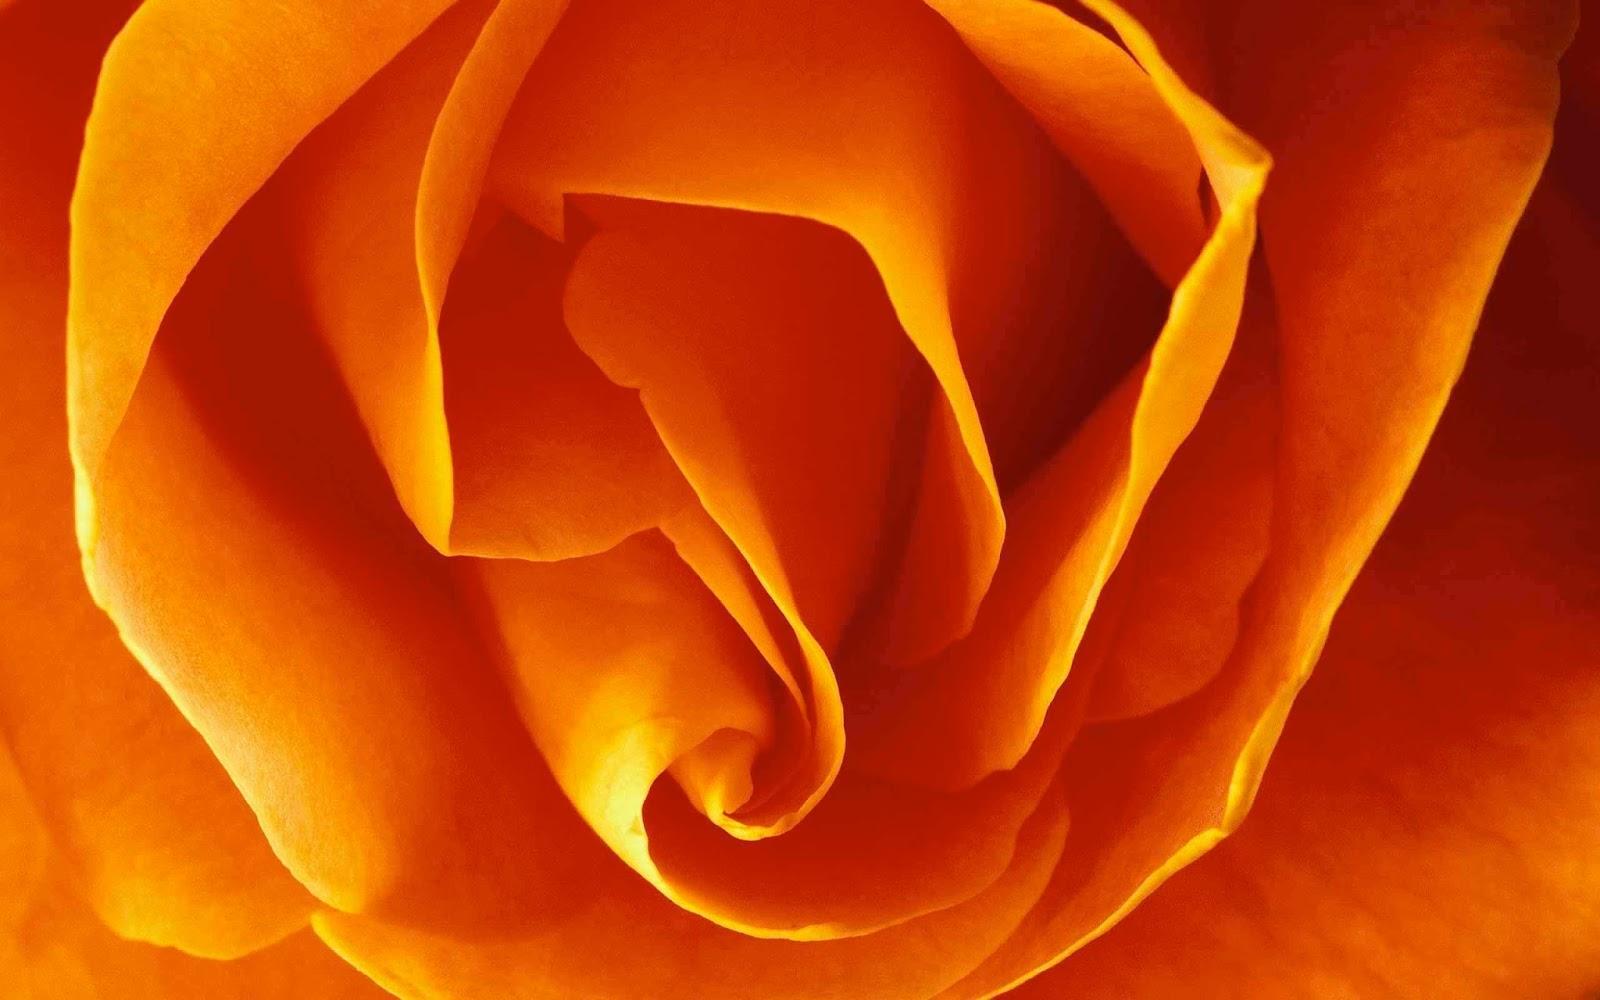 Orange Flower Wallpapers